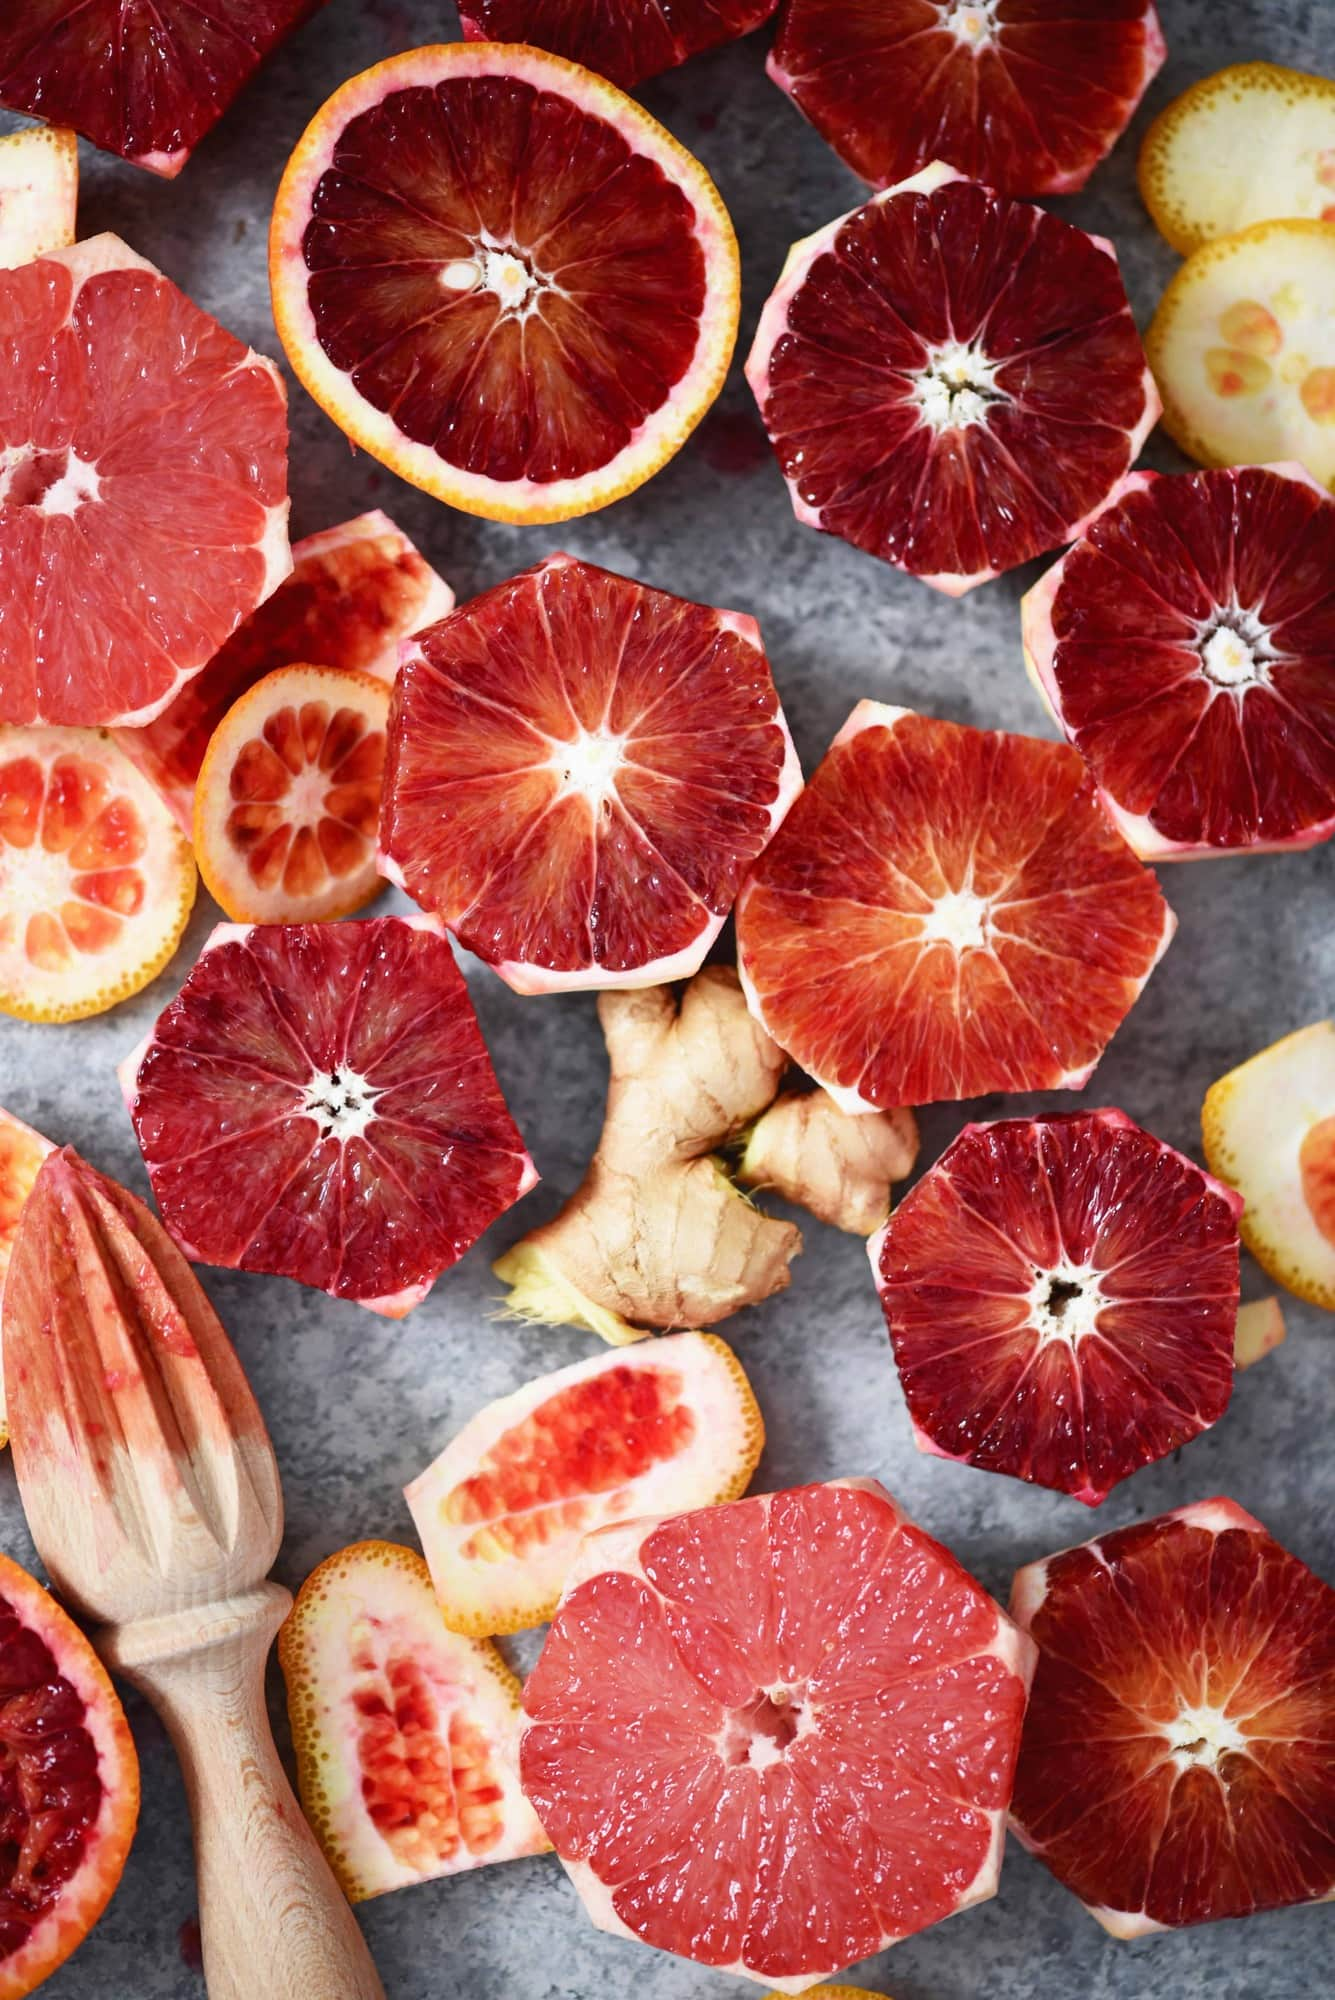 Overhead of sliced blood oranges, ginger and orange peels